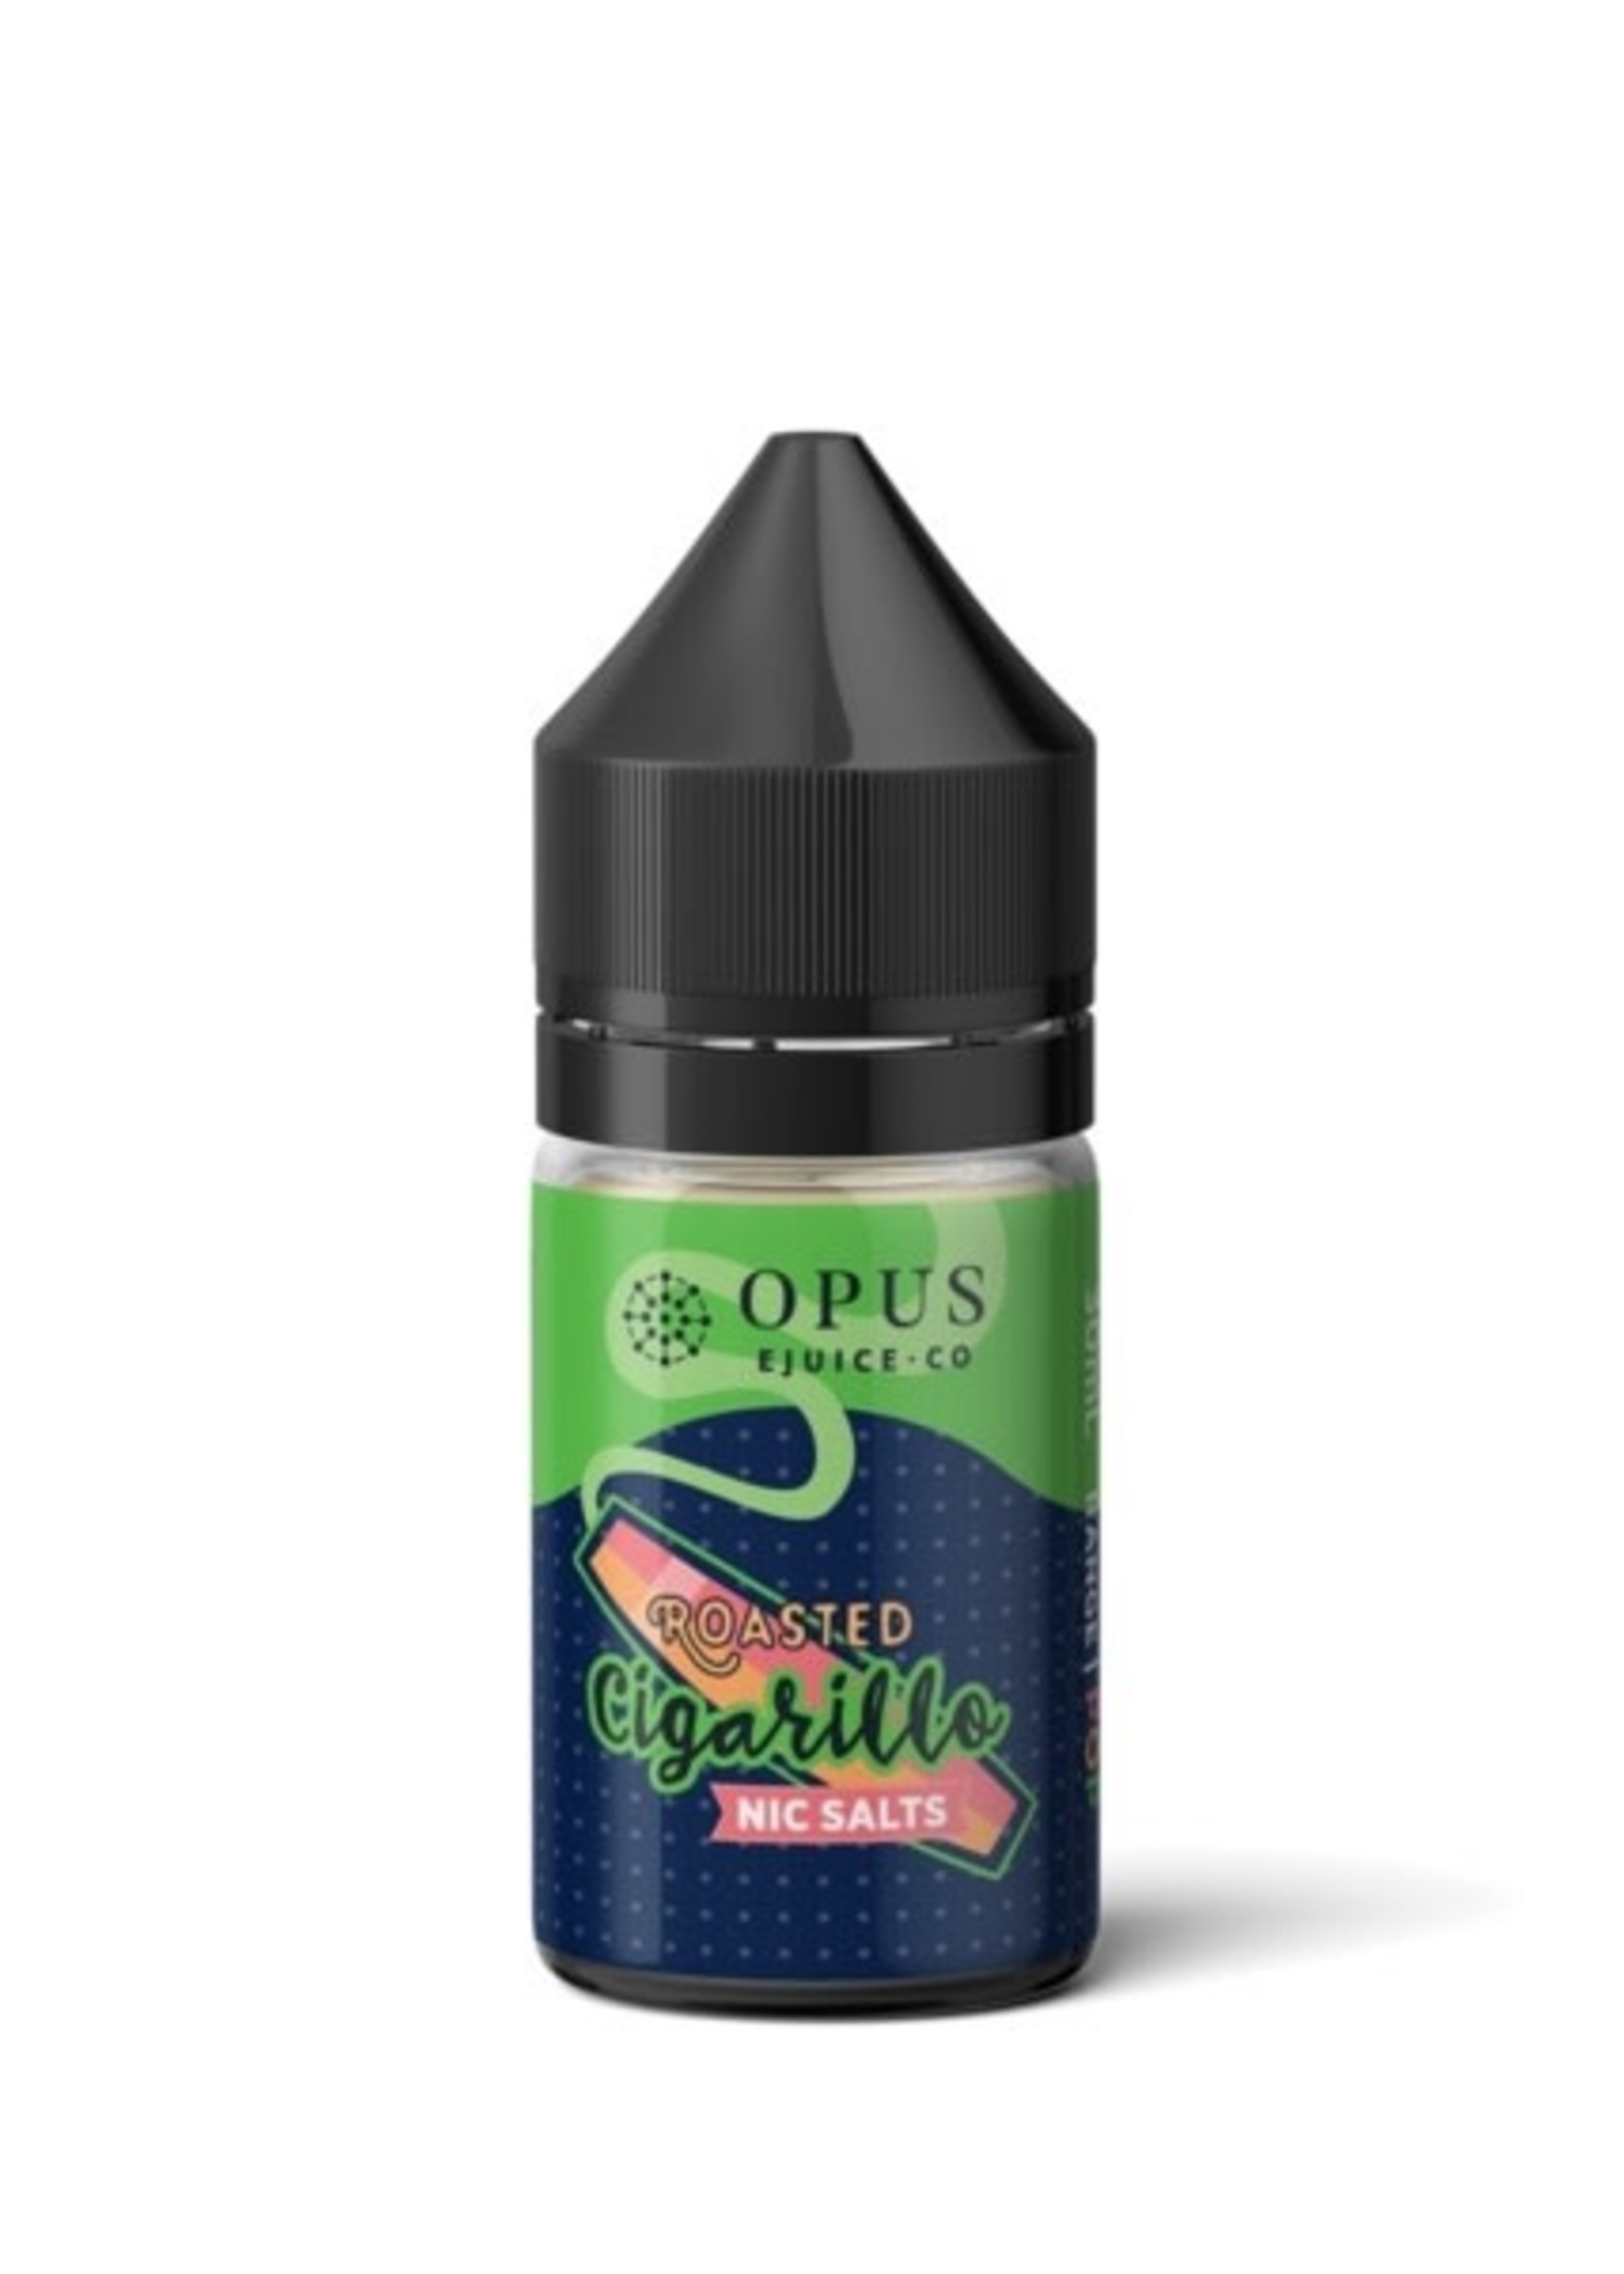 Opus Vape flavour - Roasted cigarillo salts 30ml- 20mg